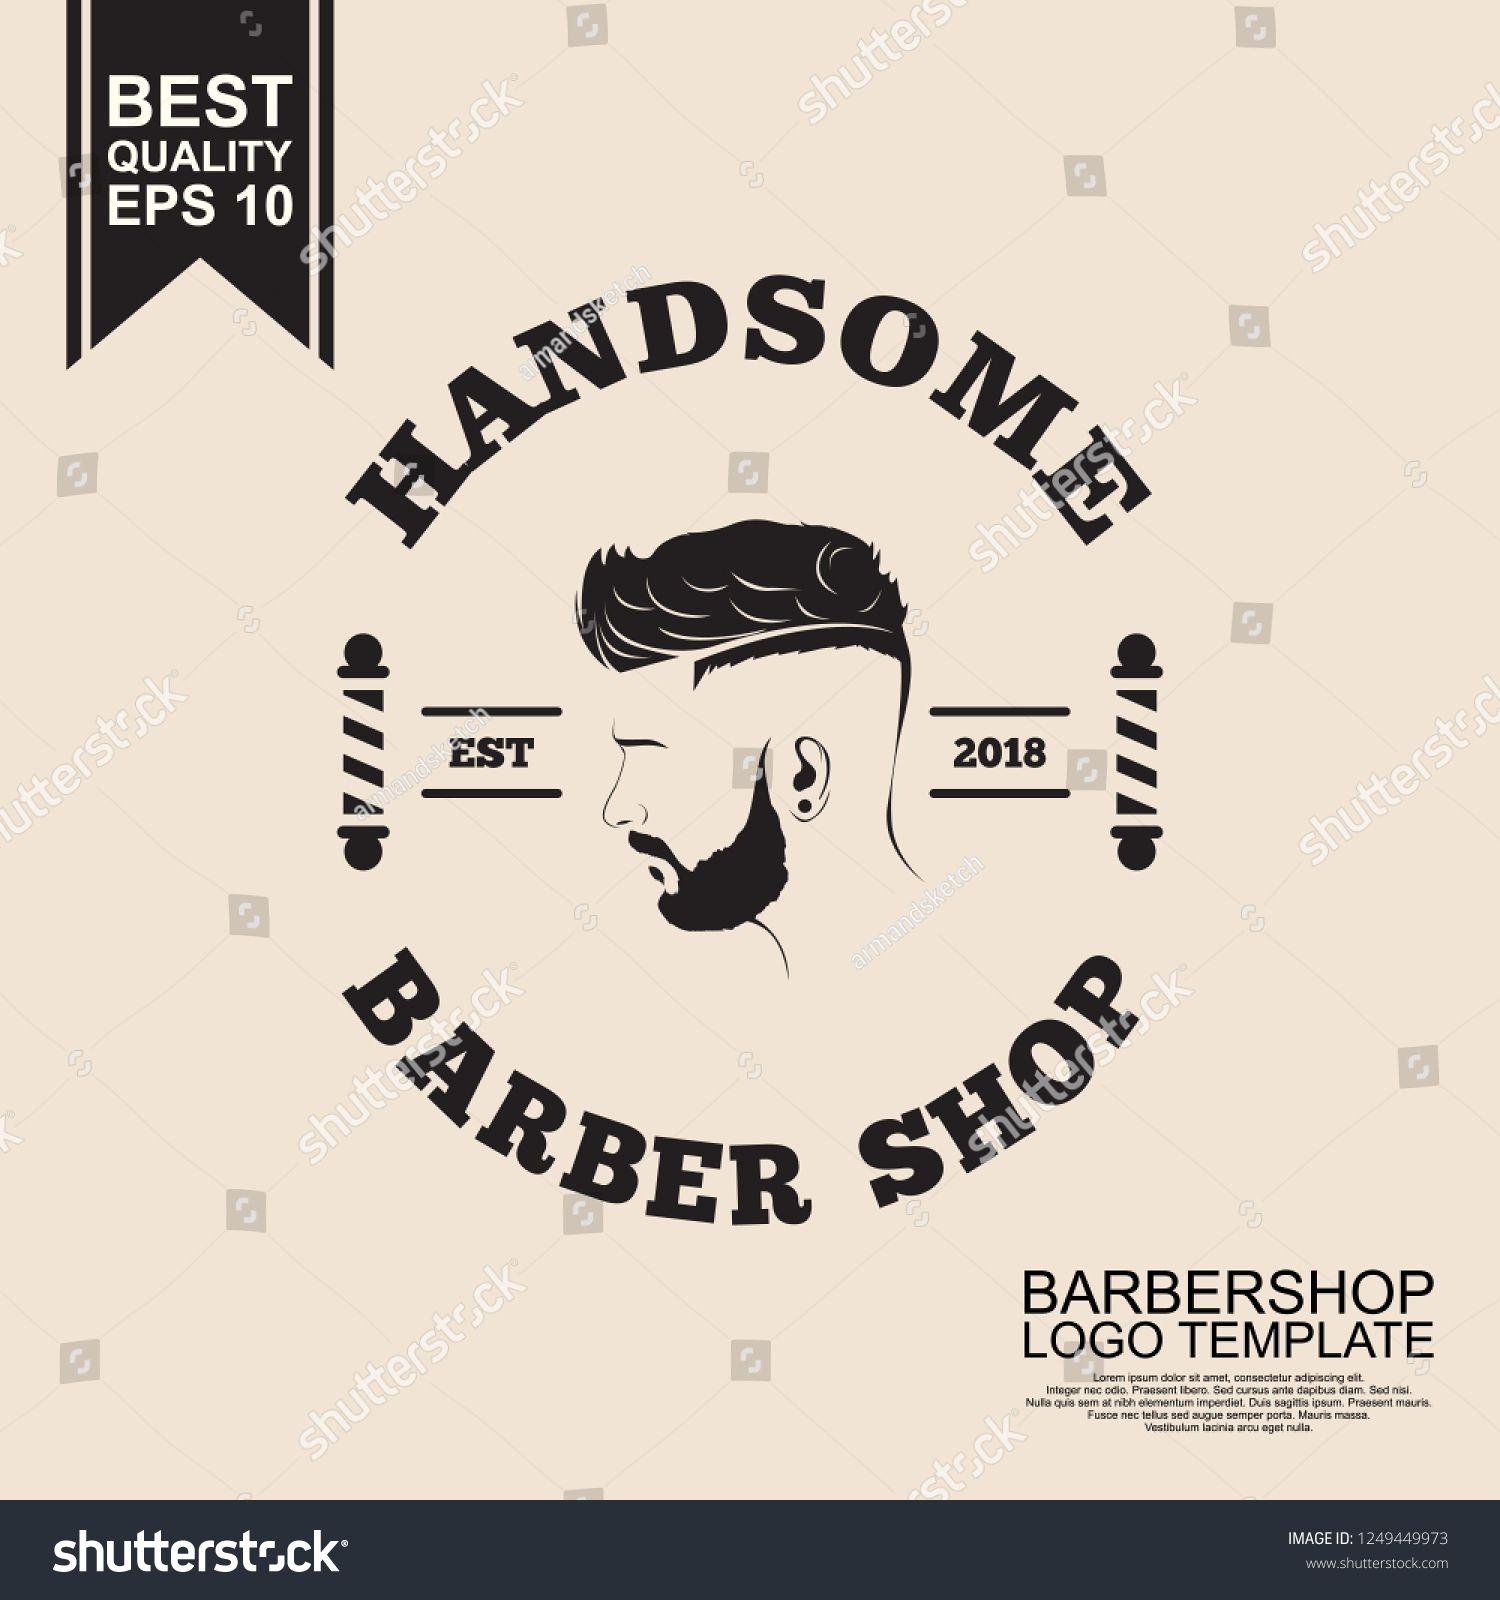 Vintage Barbershop Logo Template Logo Templates Barber Shop Templates